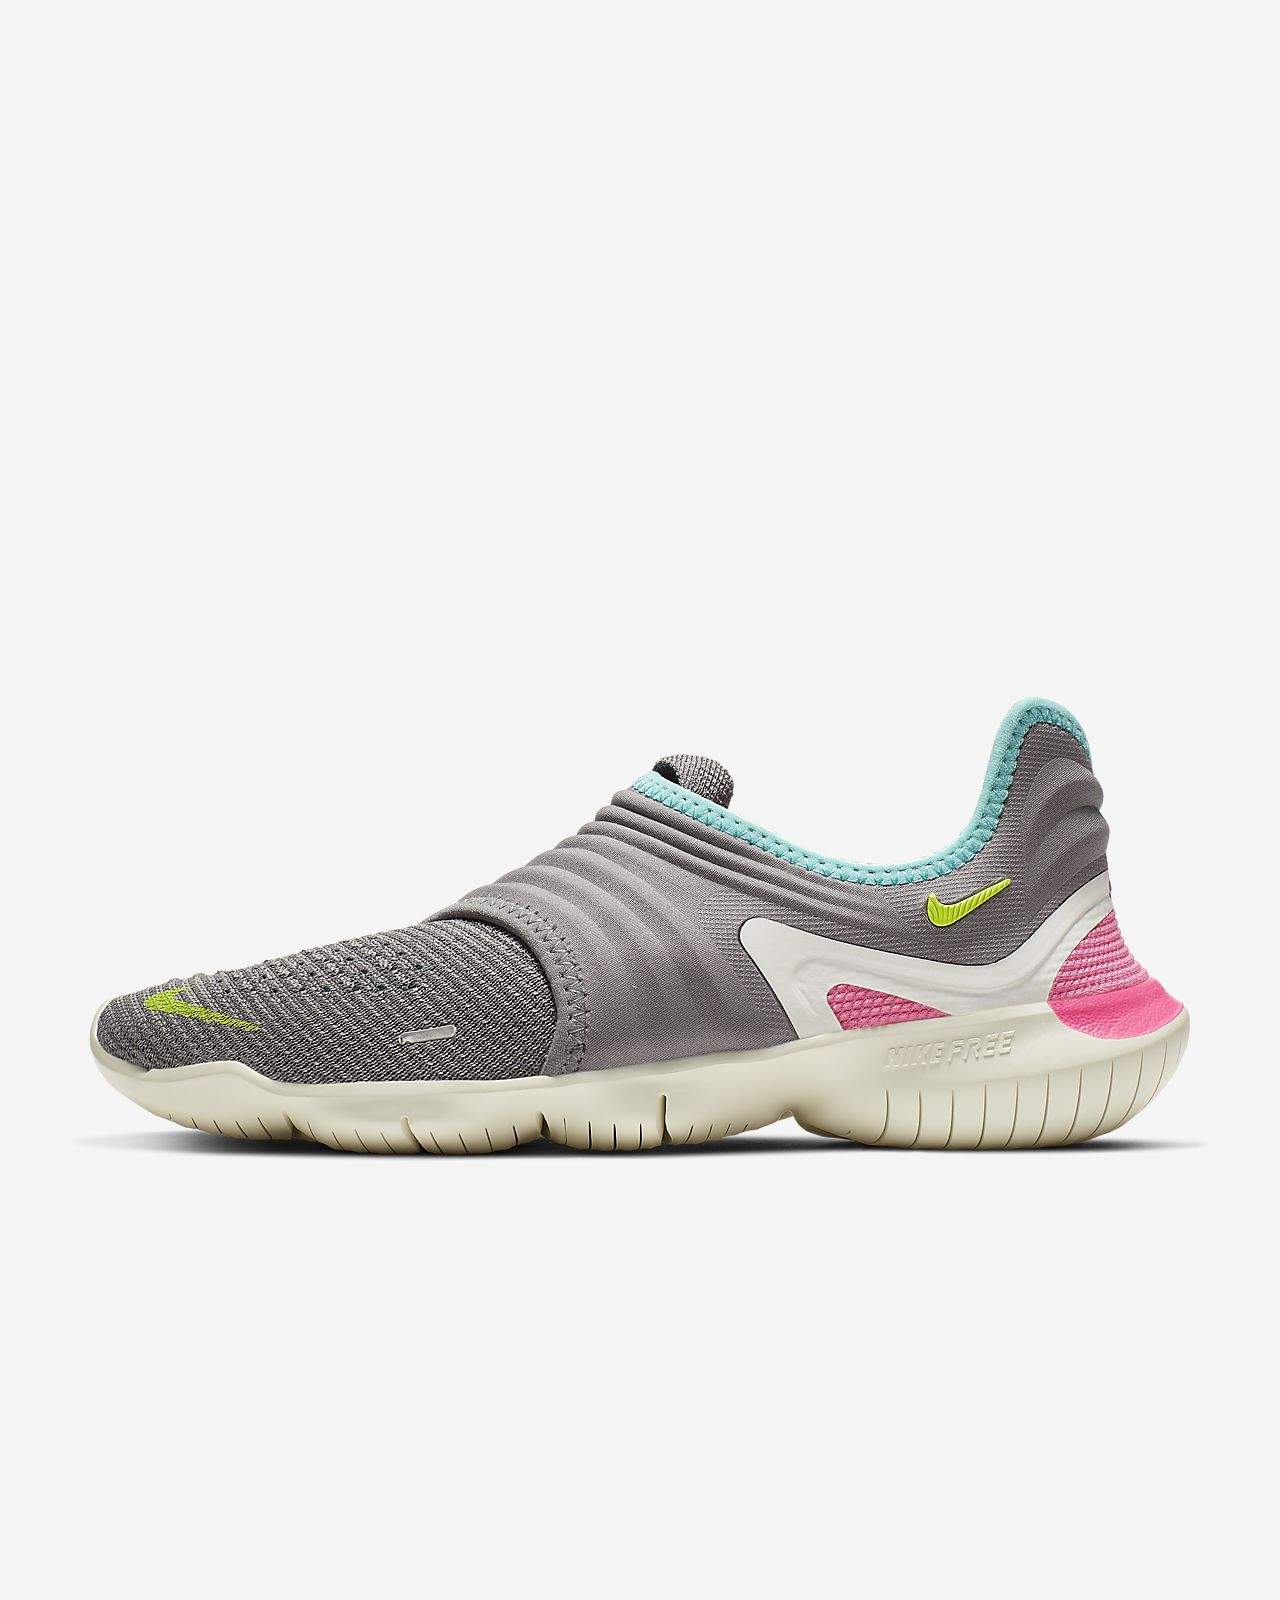 Женские беговые кроссовки Nike Free RN Flyknit 3.0